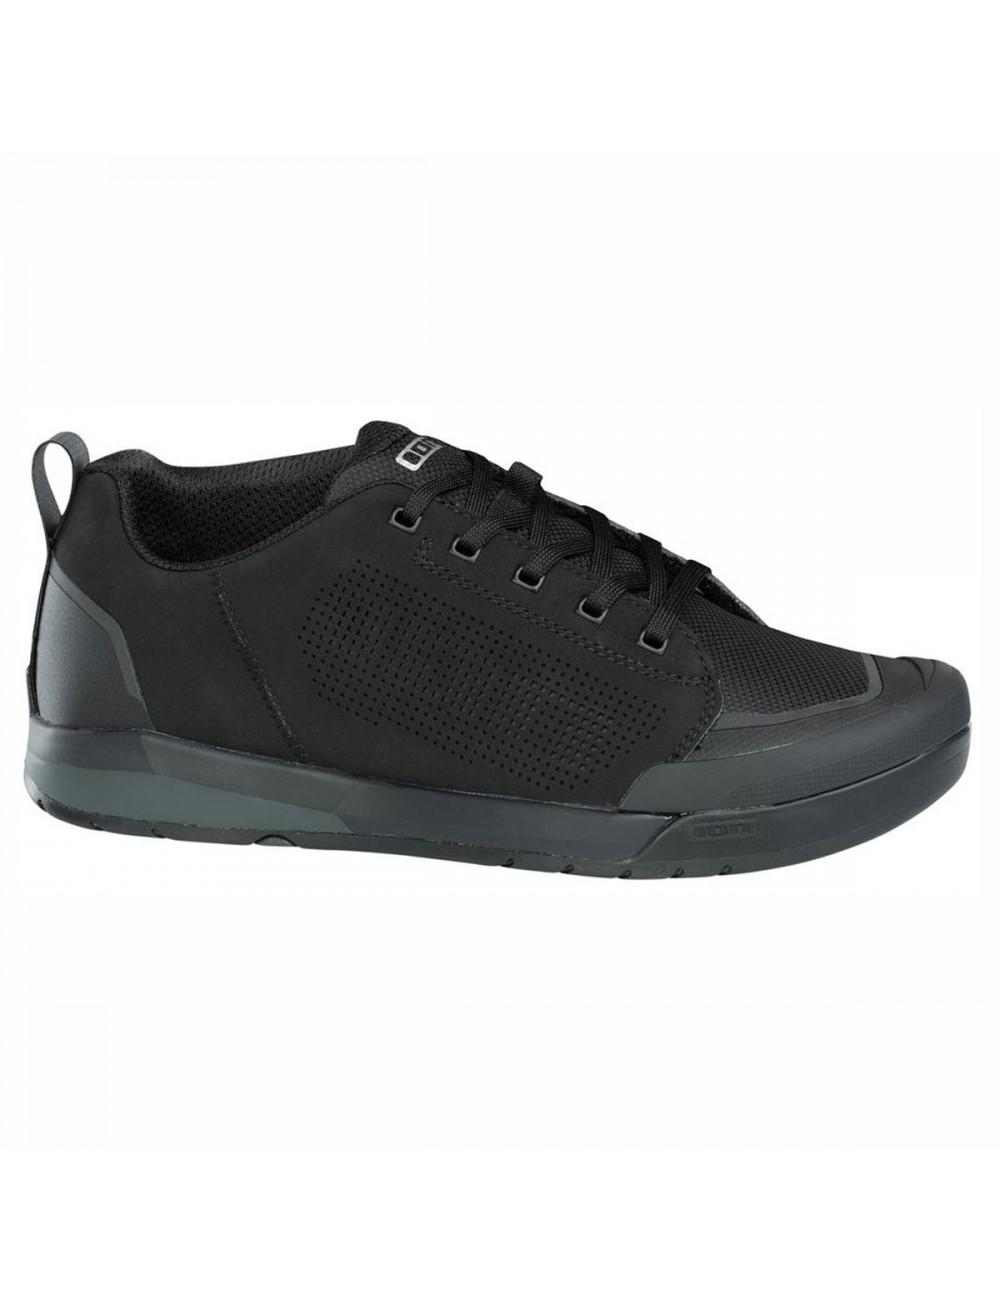 ION Raid_Amp Shoe - Black_11561